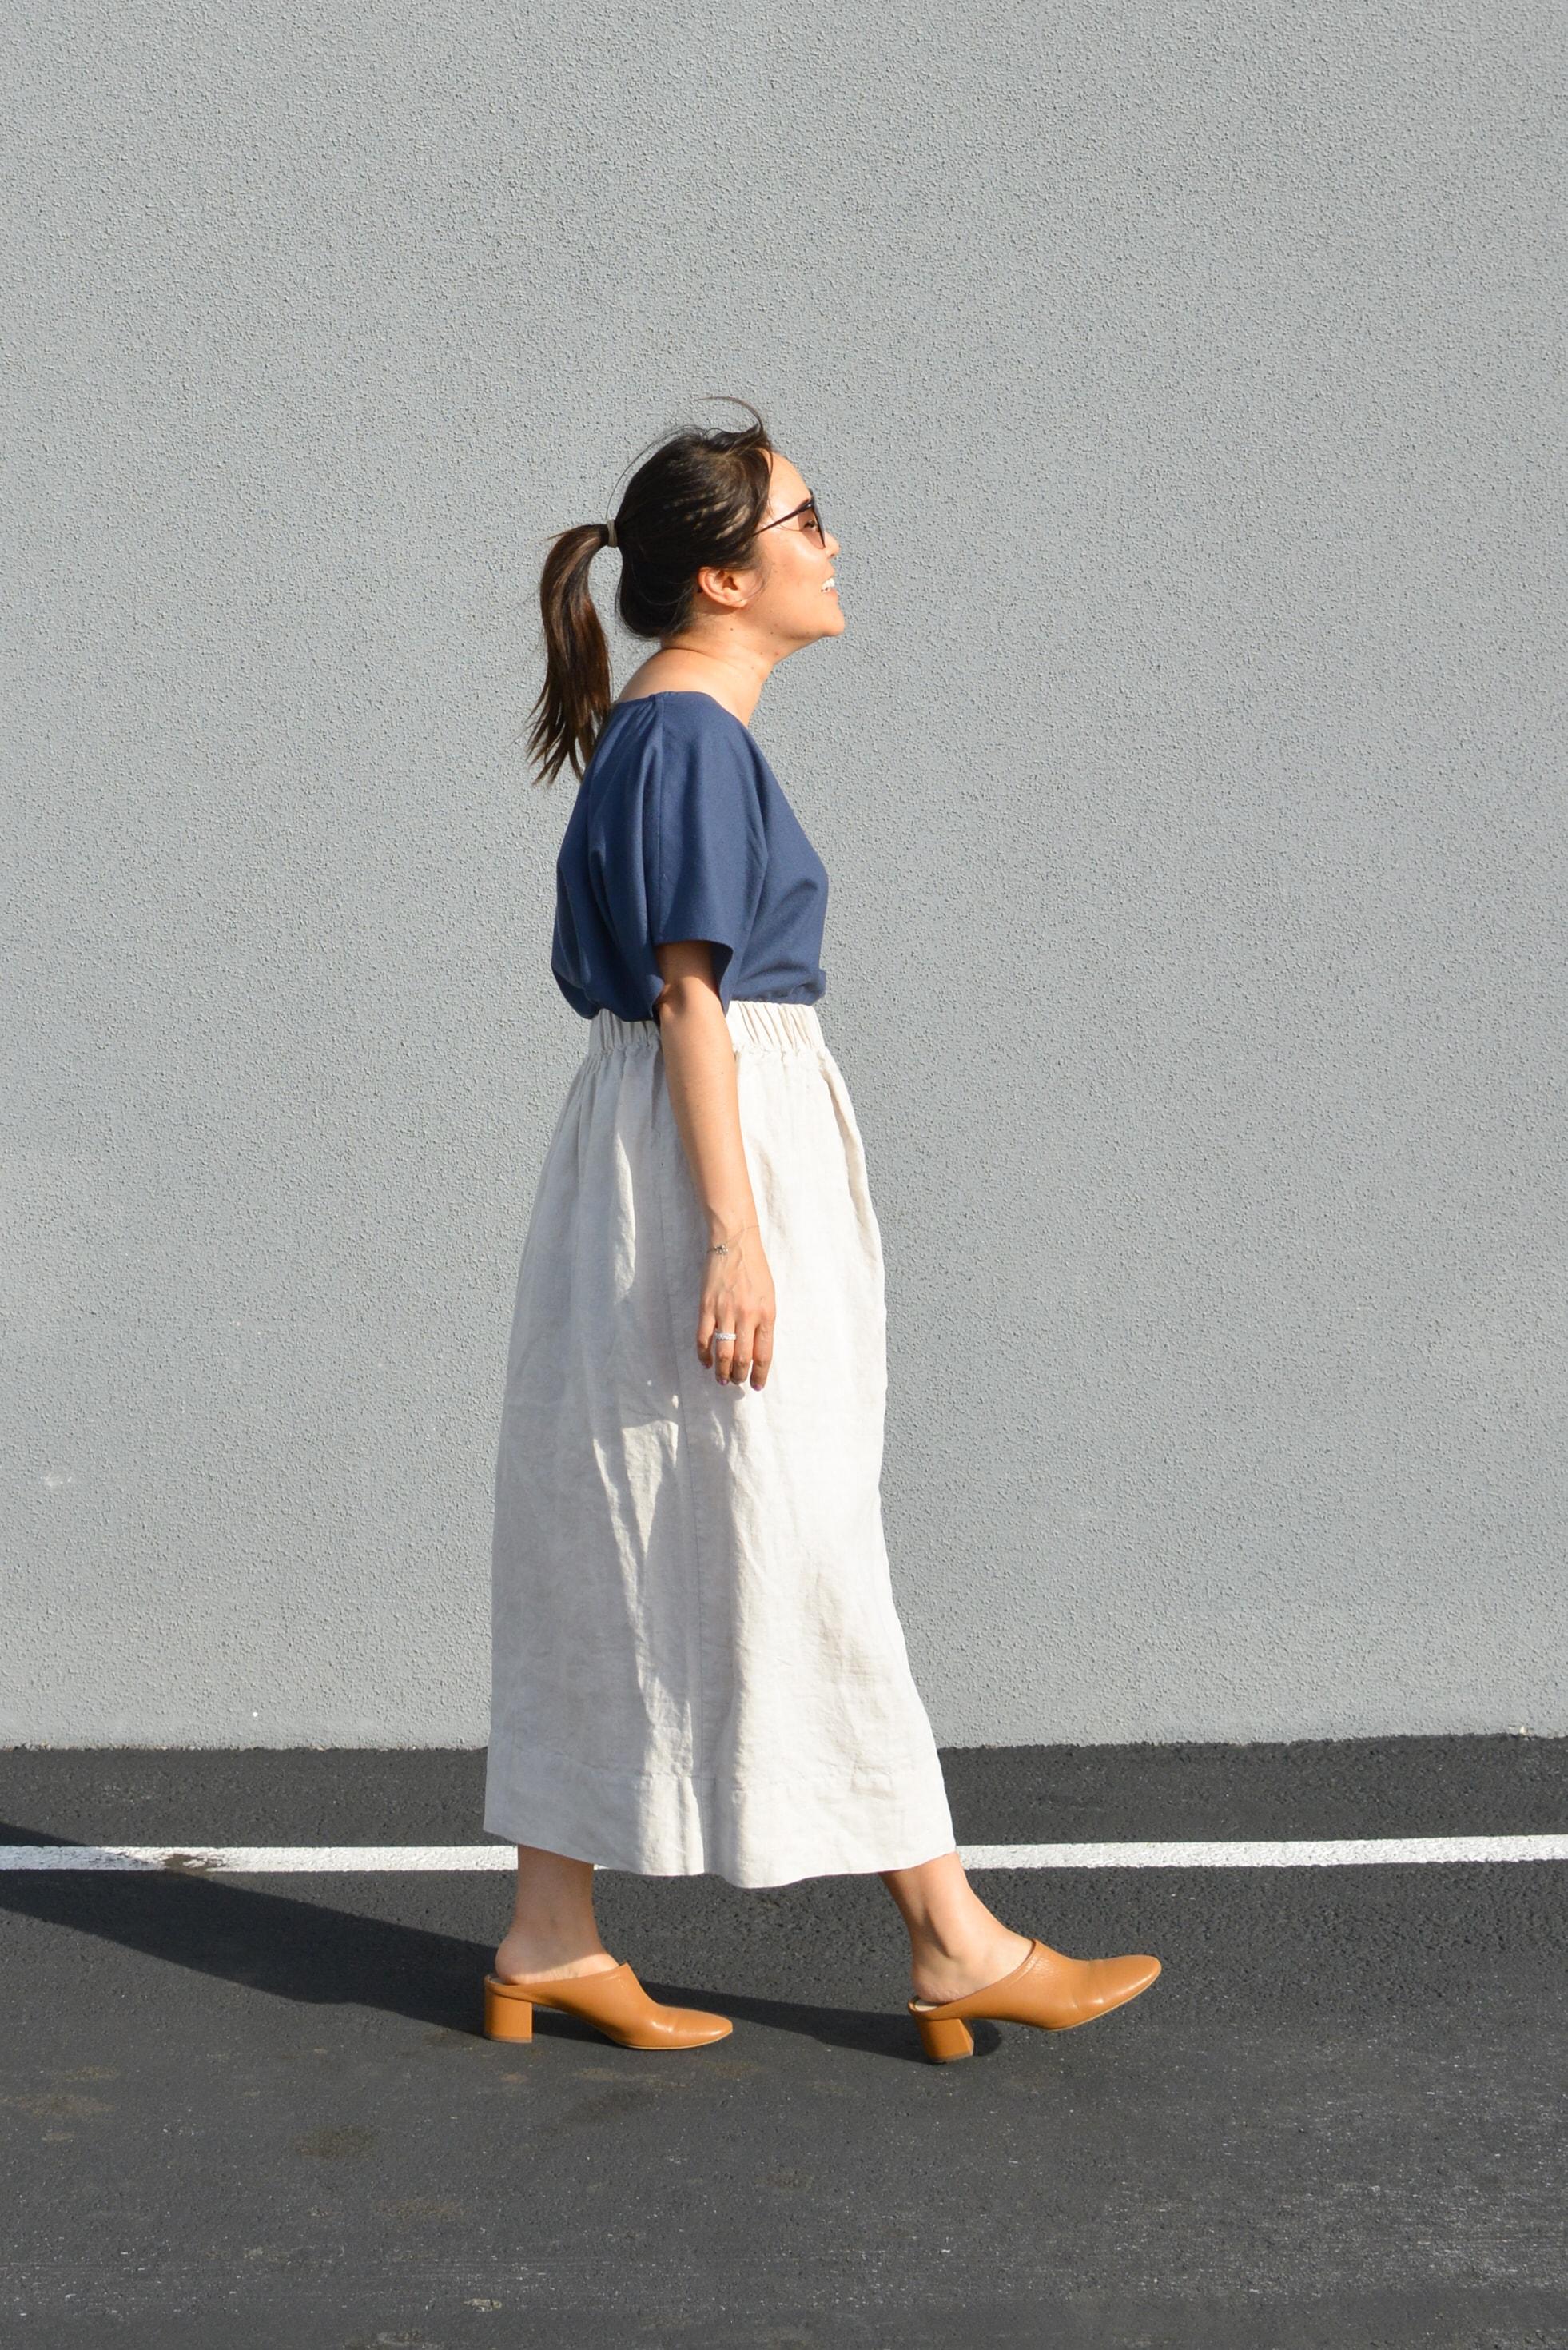 Elizabeth Suzann Review Linen Bel Skirt (4 of 6)-min.jpg